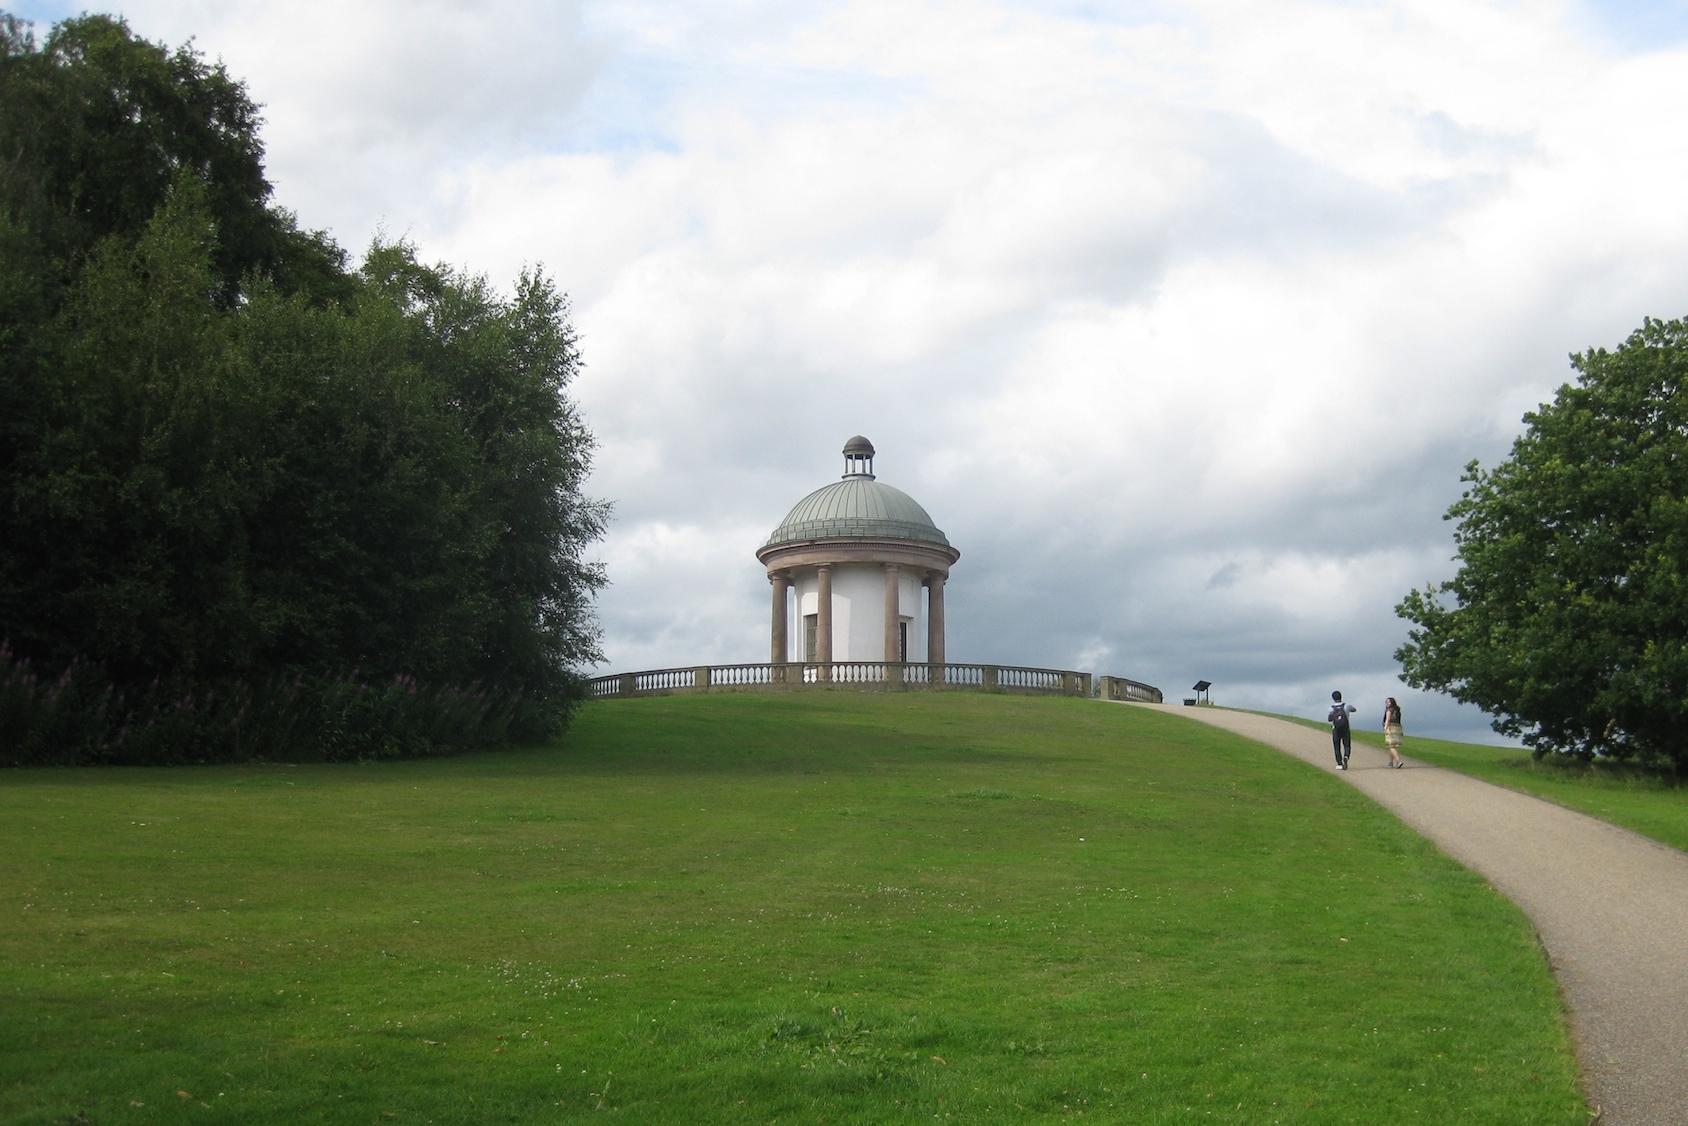 Heaton Park Temple